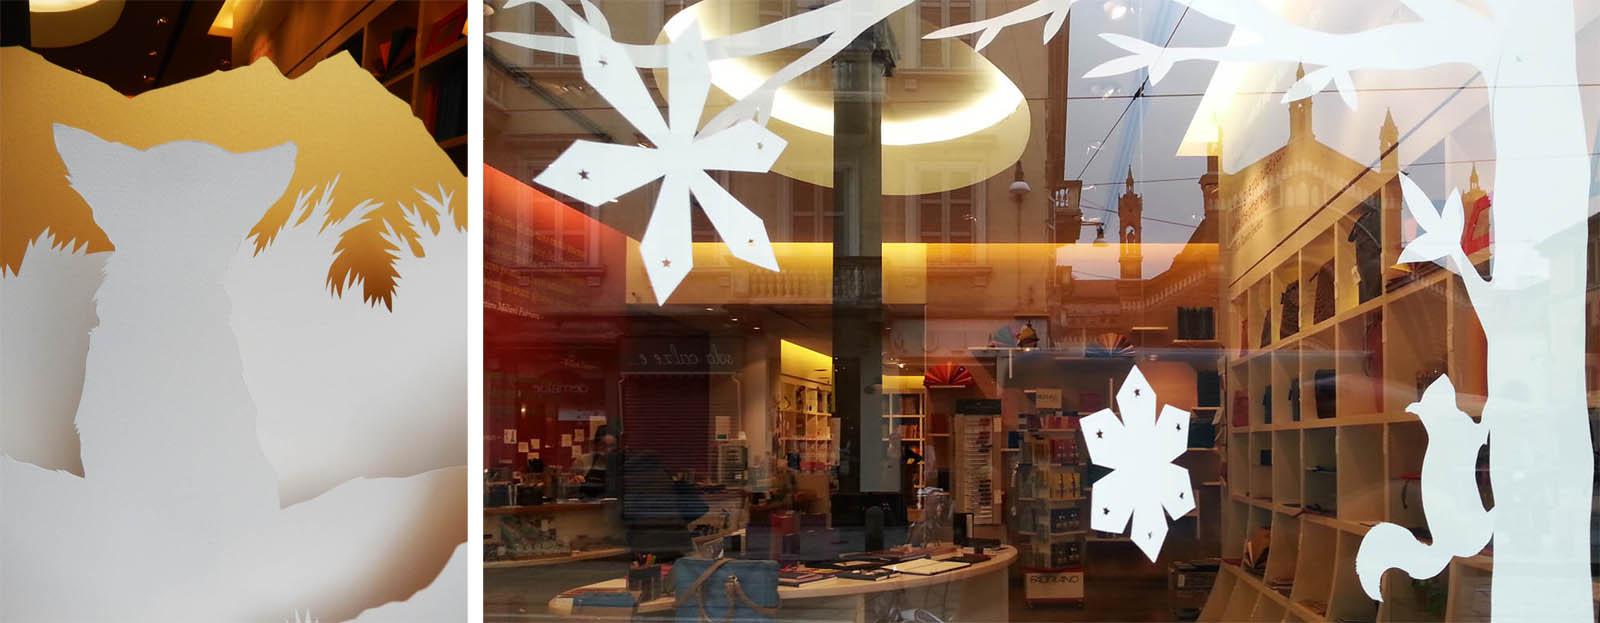 inverno-papercut-fabriano-vetrine-wonderland-milano (7)